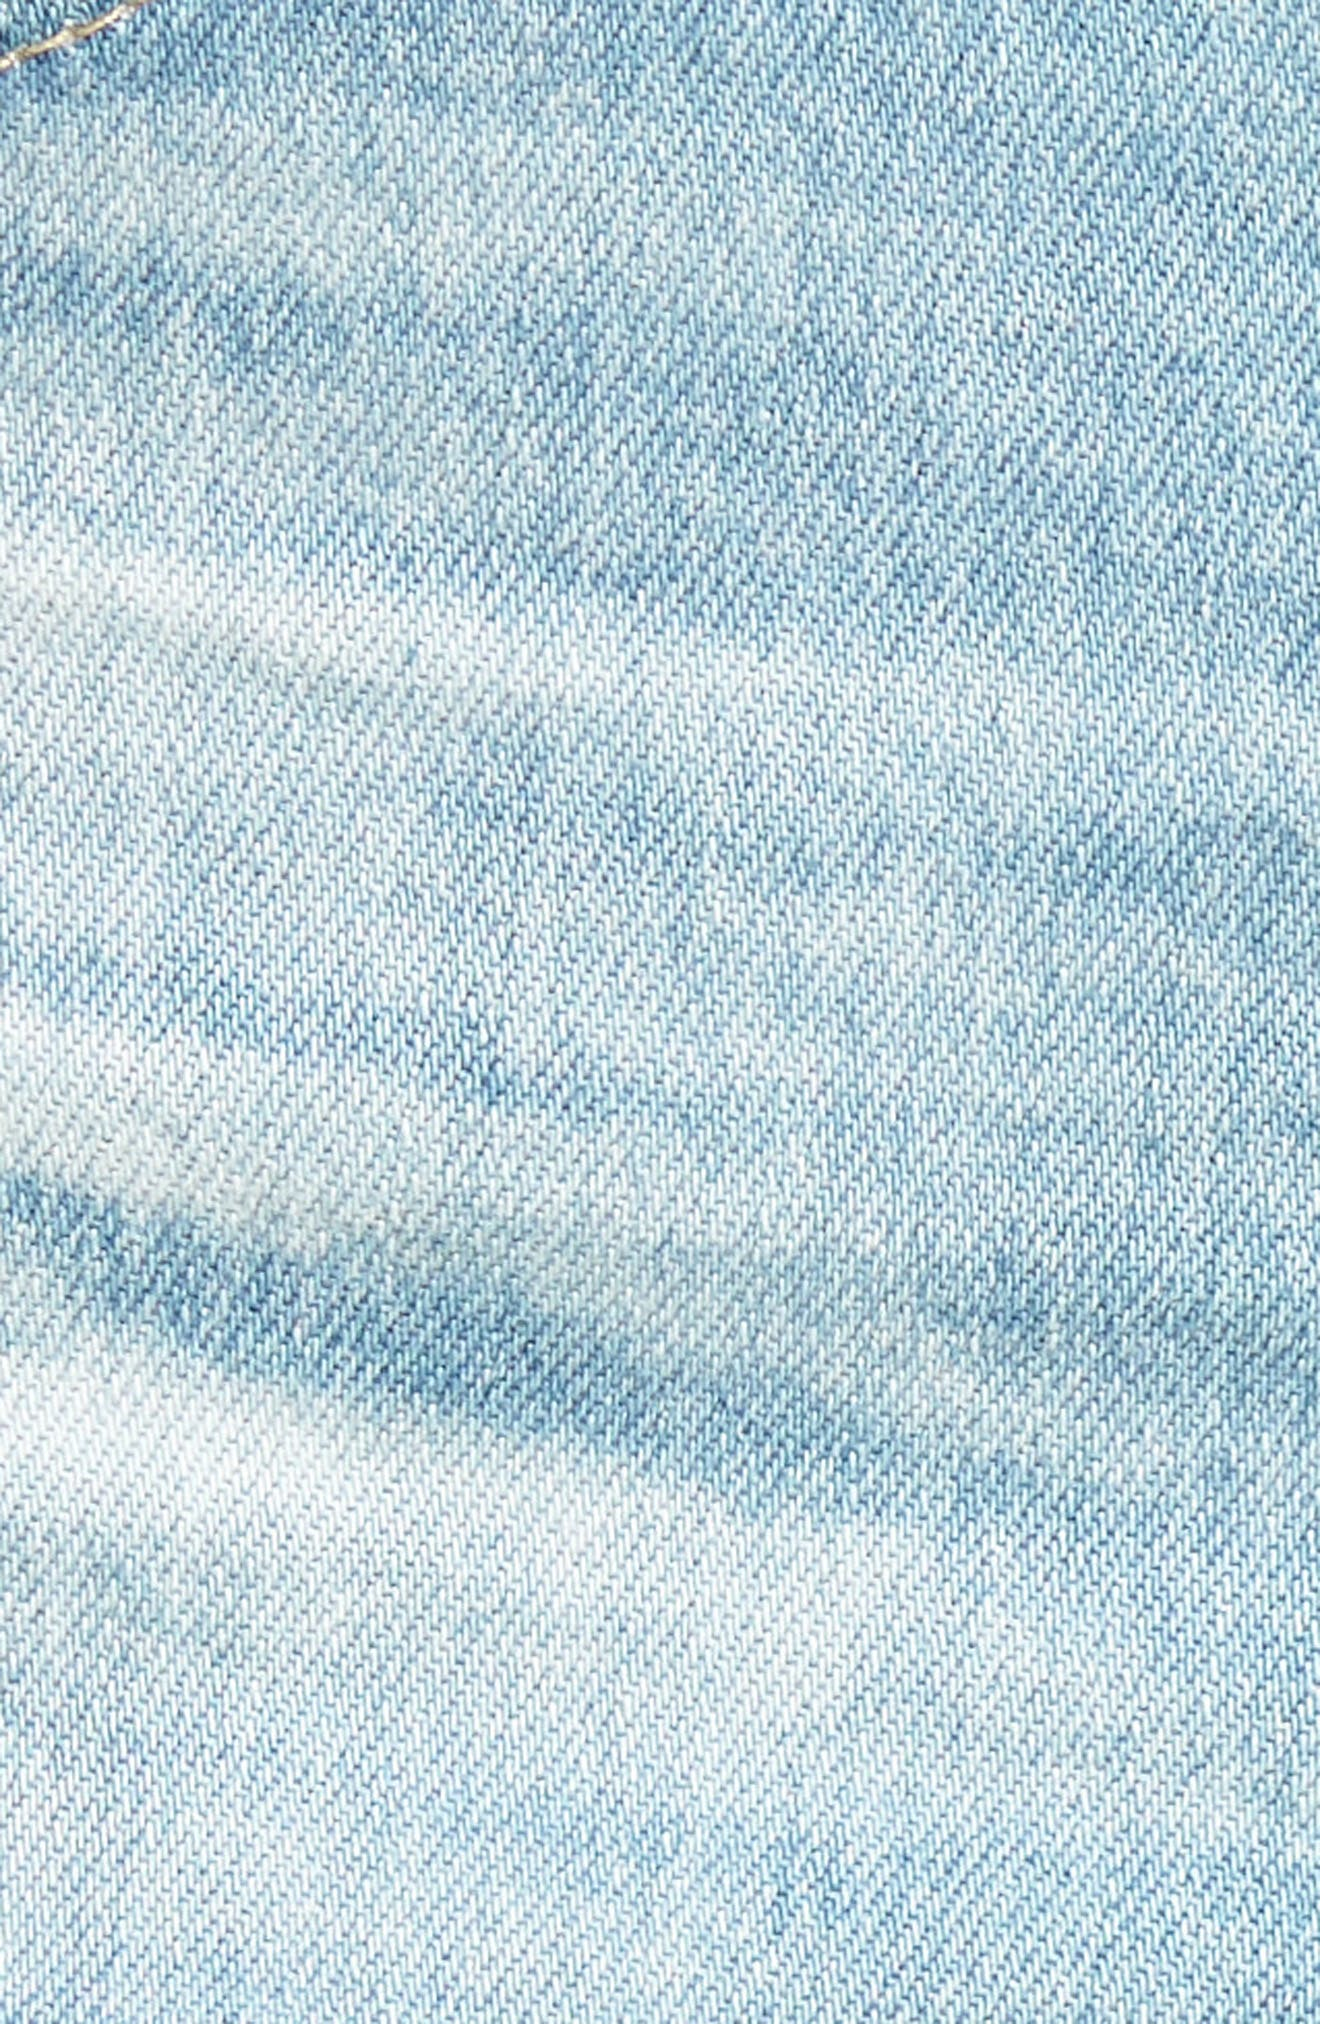 Bryn High Waist Cutoff Denim Shorts,                             Alternate thumbnail 6, color,                             426